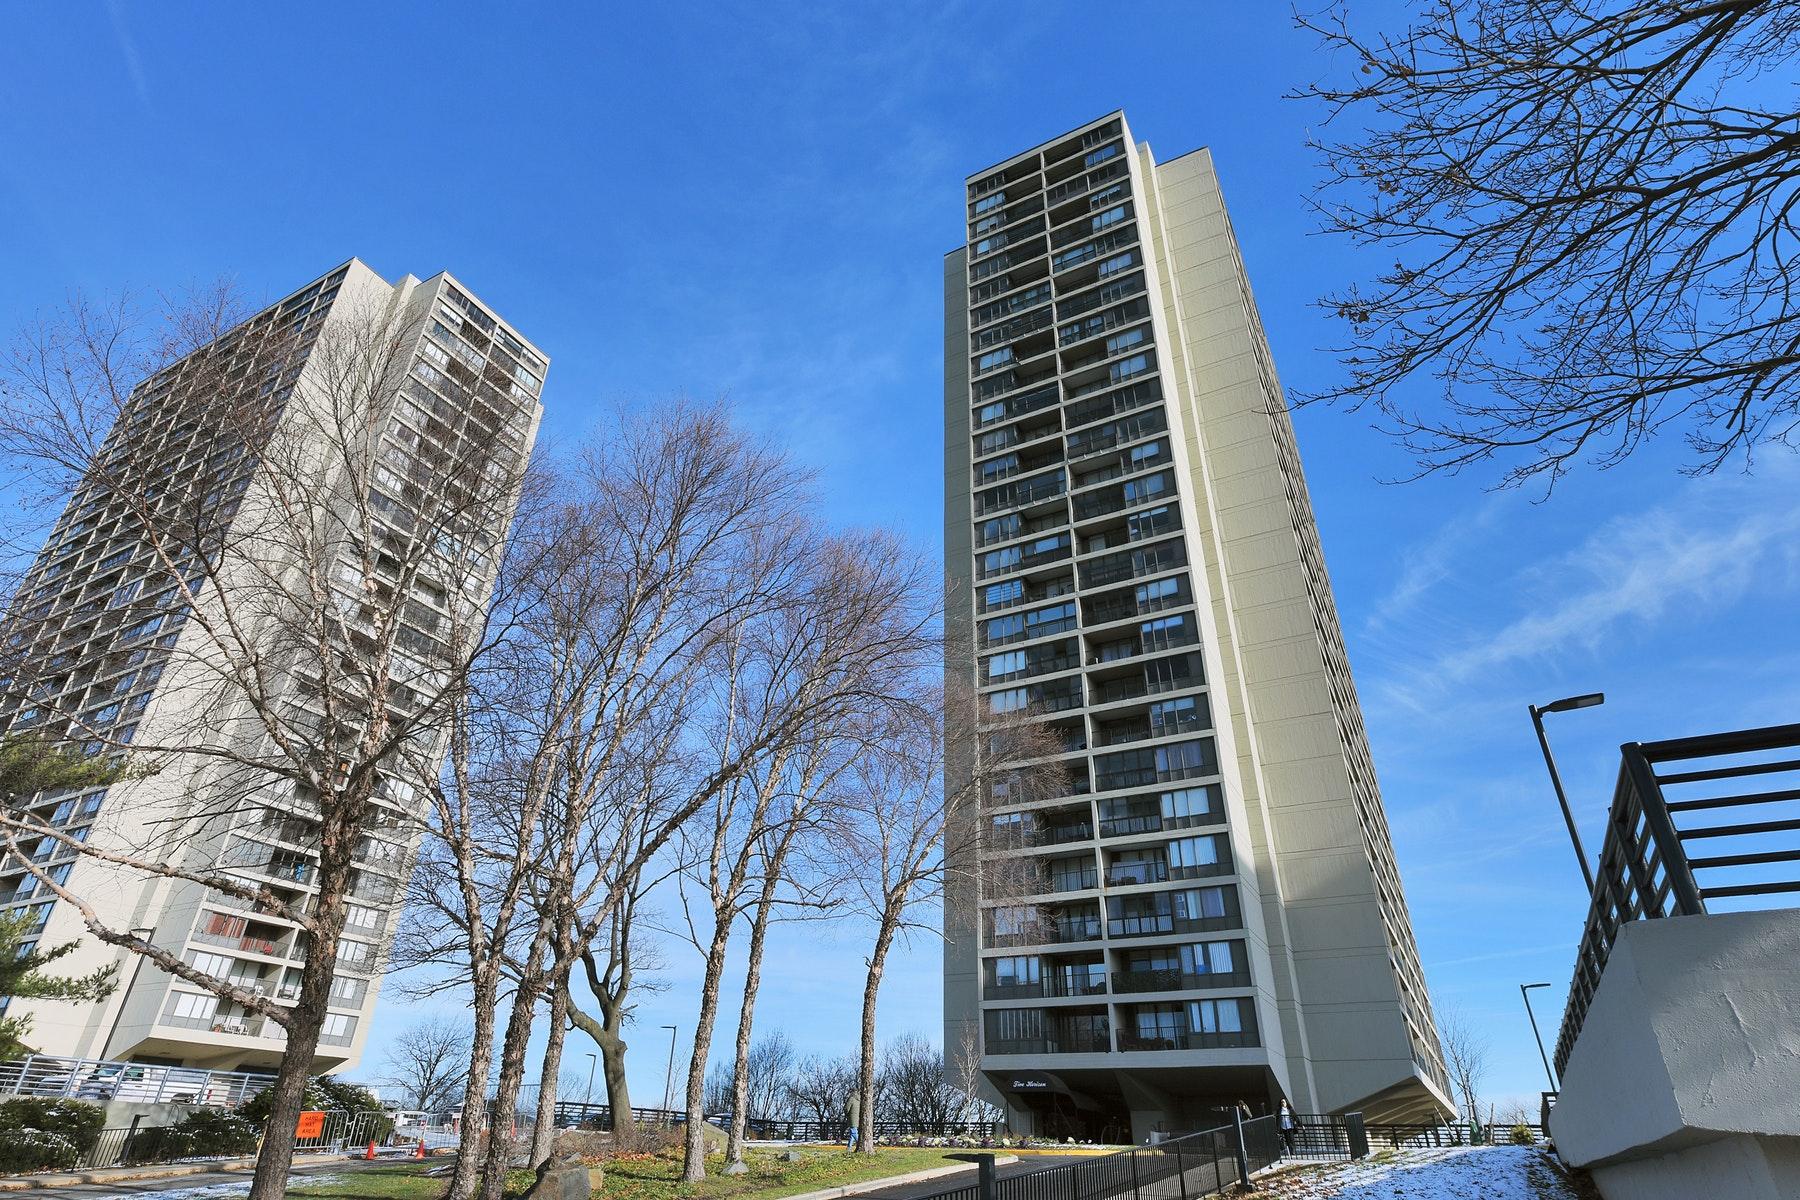 Co-op Properties para Venda às Horizon House 5 Horizon Road #705, Fort Lee, Nova Jersey 07024 Estados Unidos